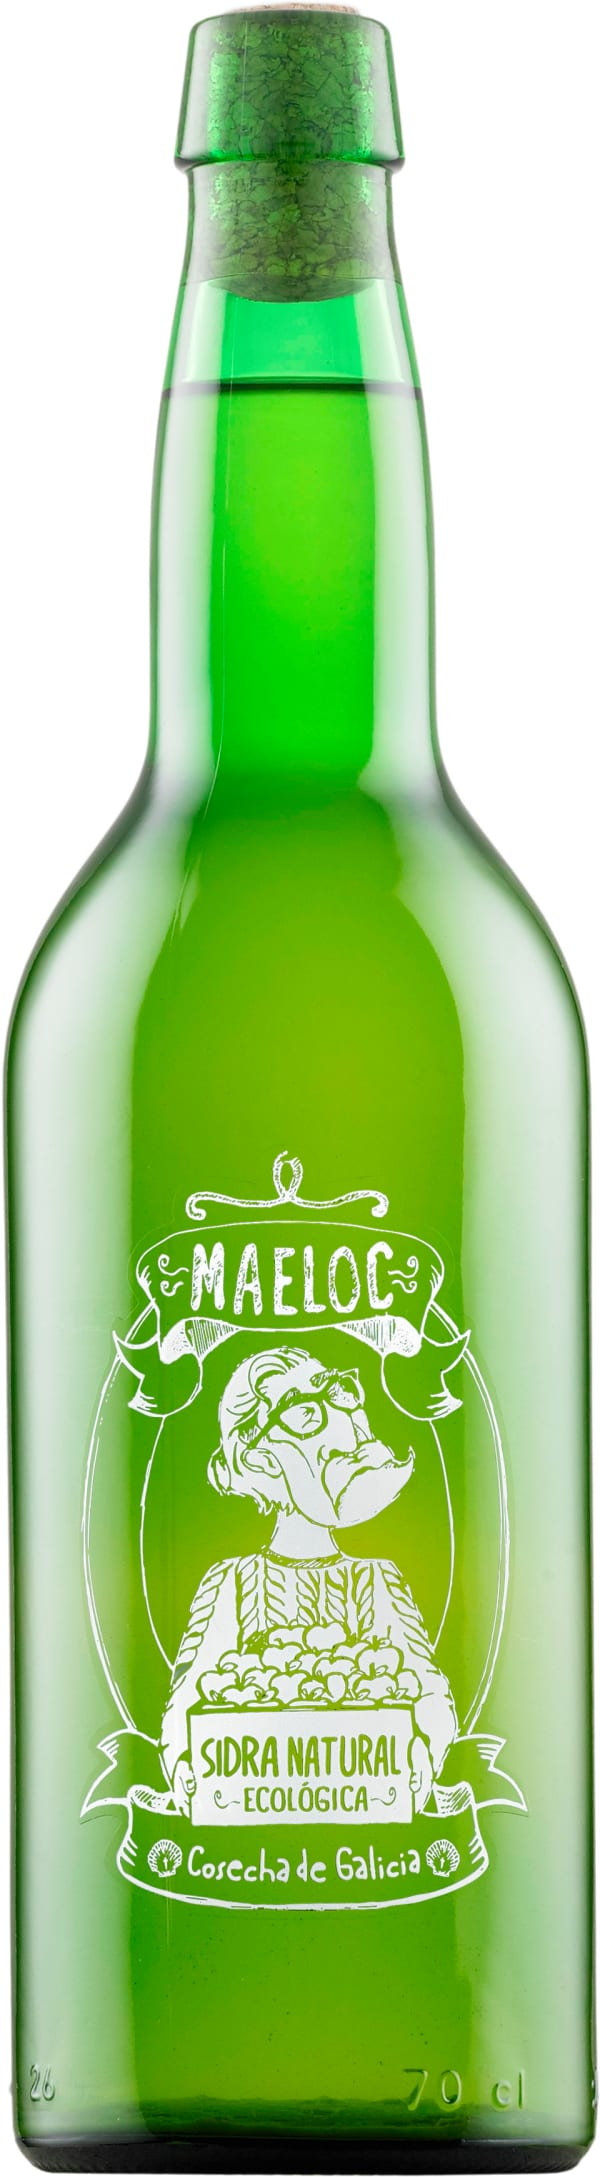 Maeloc Sidra Natural